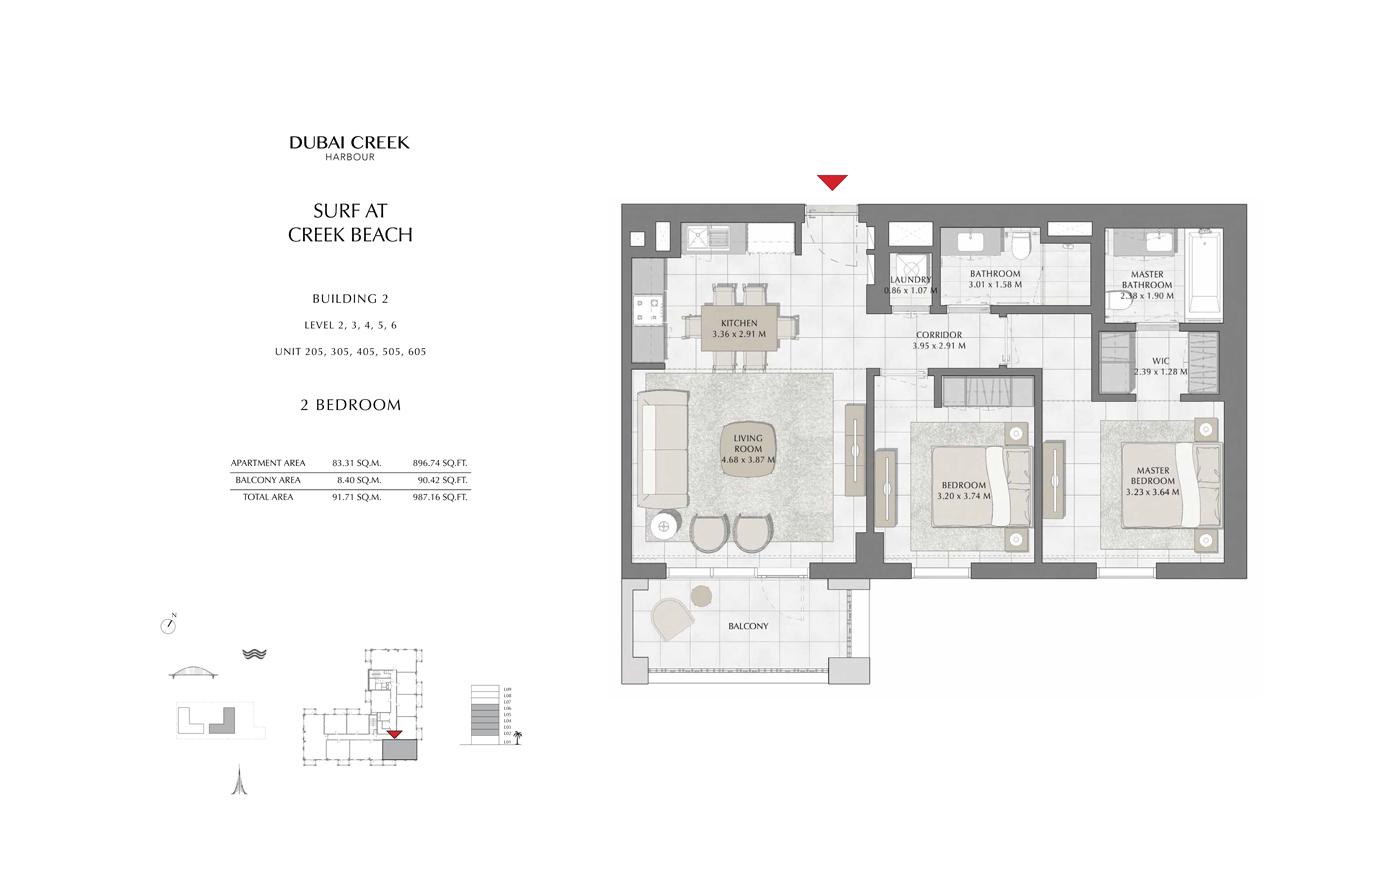 Building 2, 2 Bedroom Level 2, 3, 4, 5, 6, Size 987 Sqft